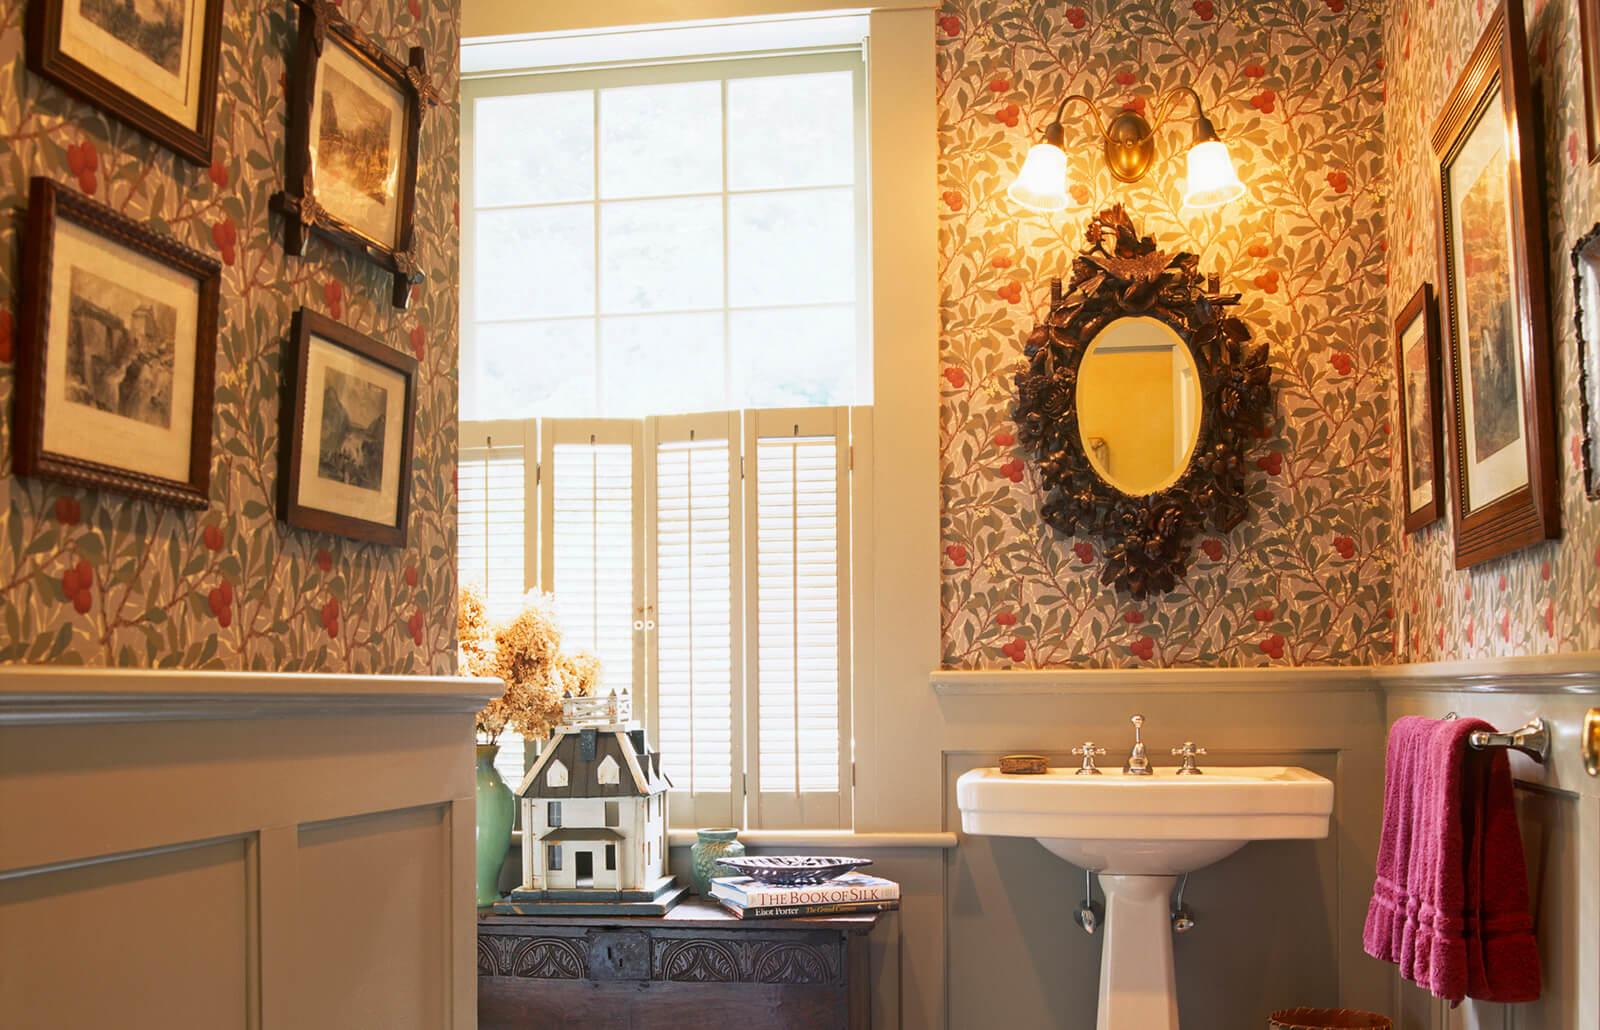 Vintage Bathroom Decor Ideas From Cute, Vintage Bathroom Decor